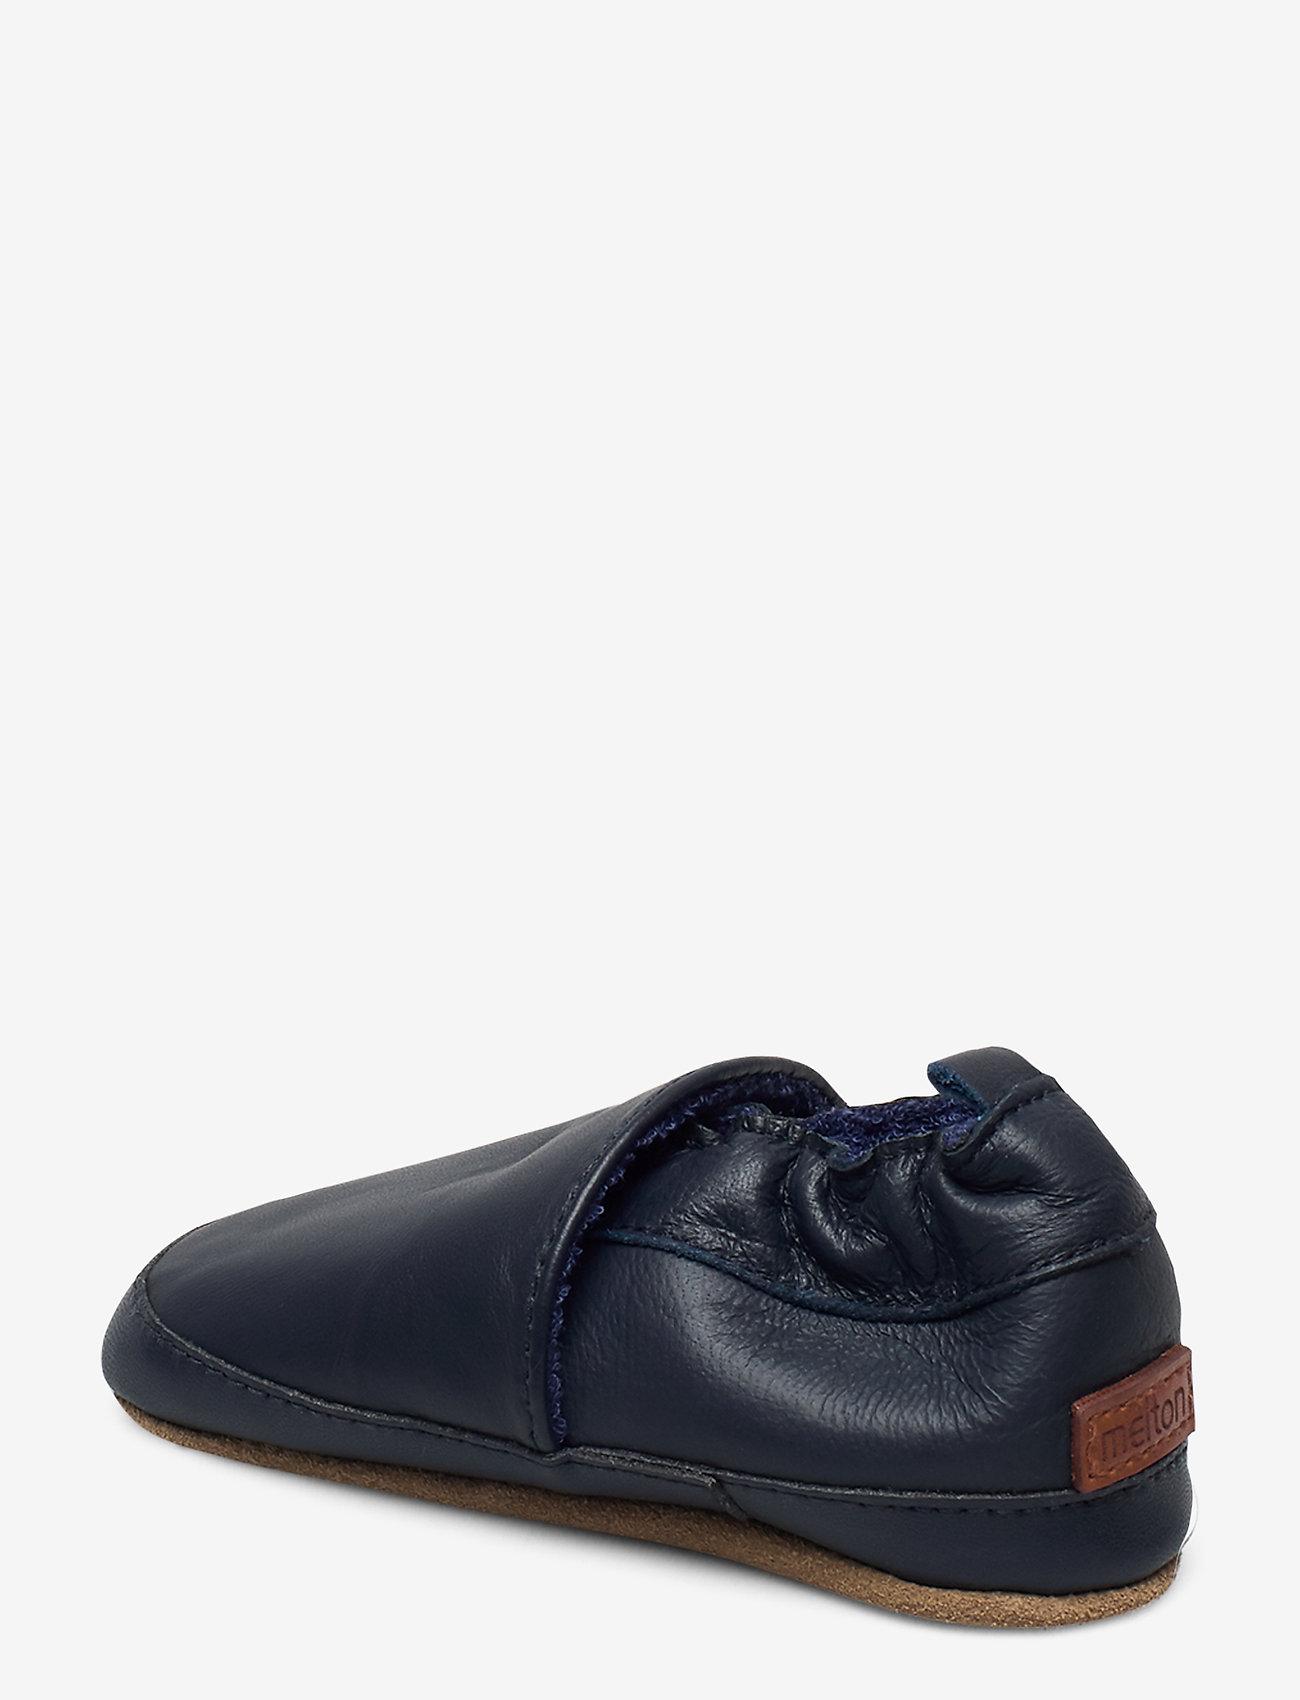 Melton - Leather shoe - Loafer - domowe - 287/bluenights - 1